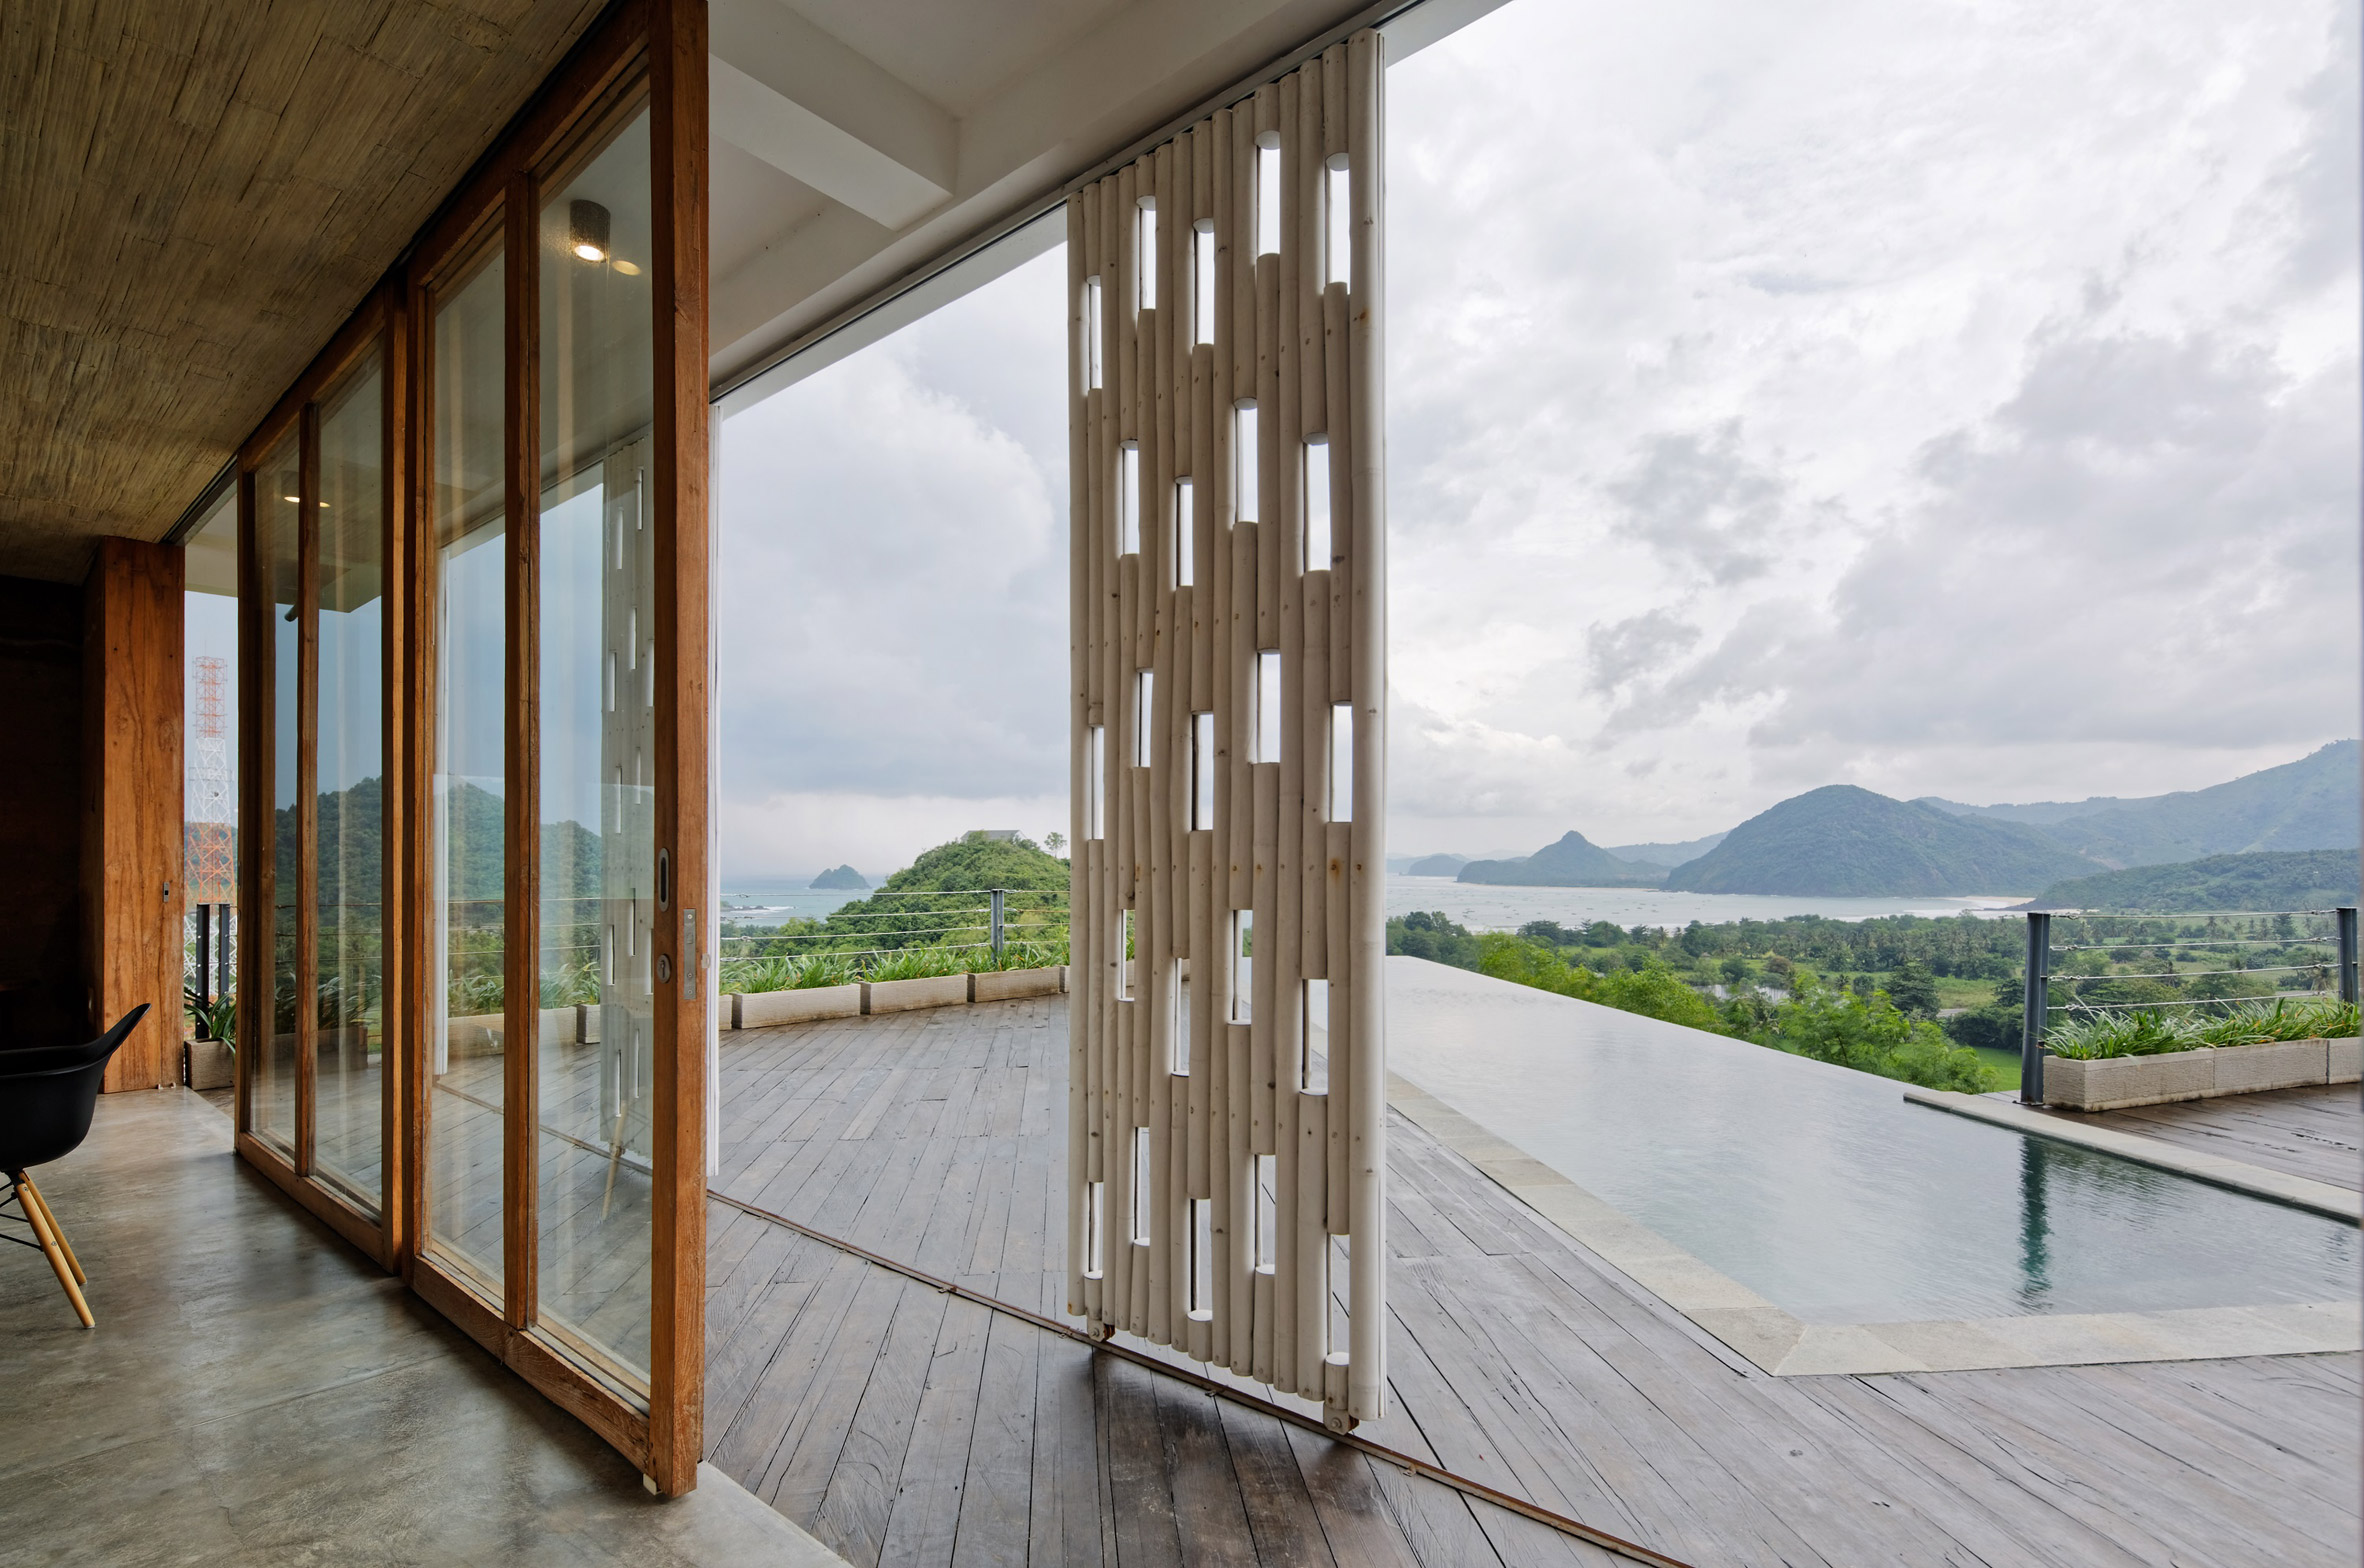 clay-house-budi-pradono-architects-architecture_dezeen_2364_col_7.jpg